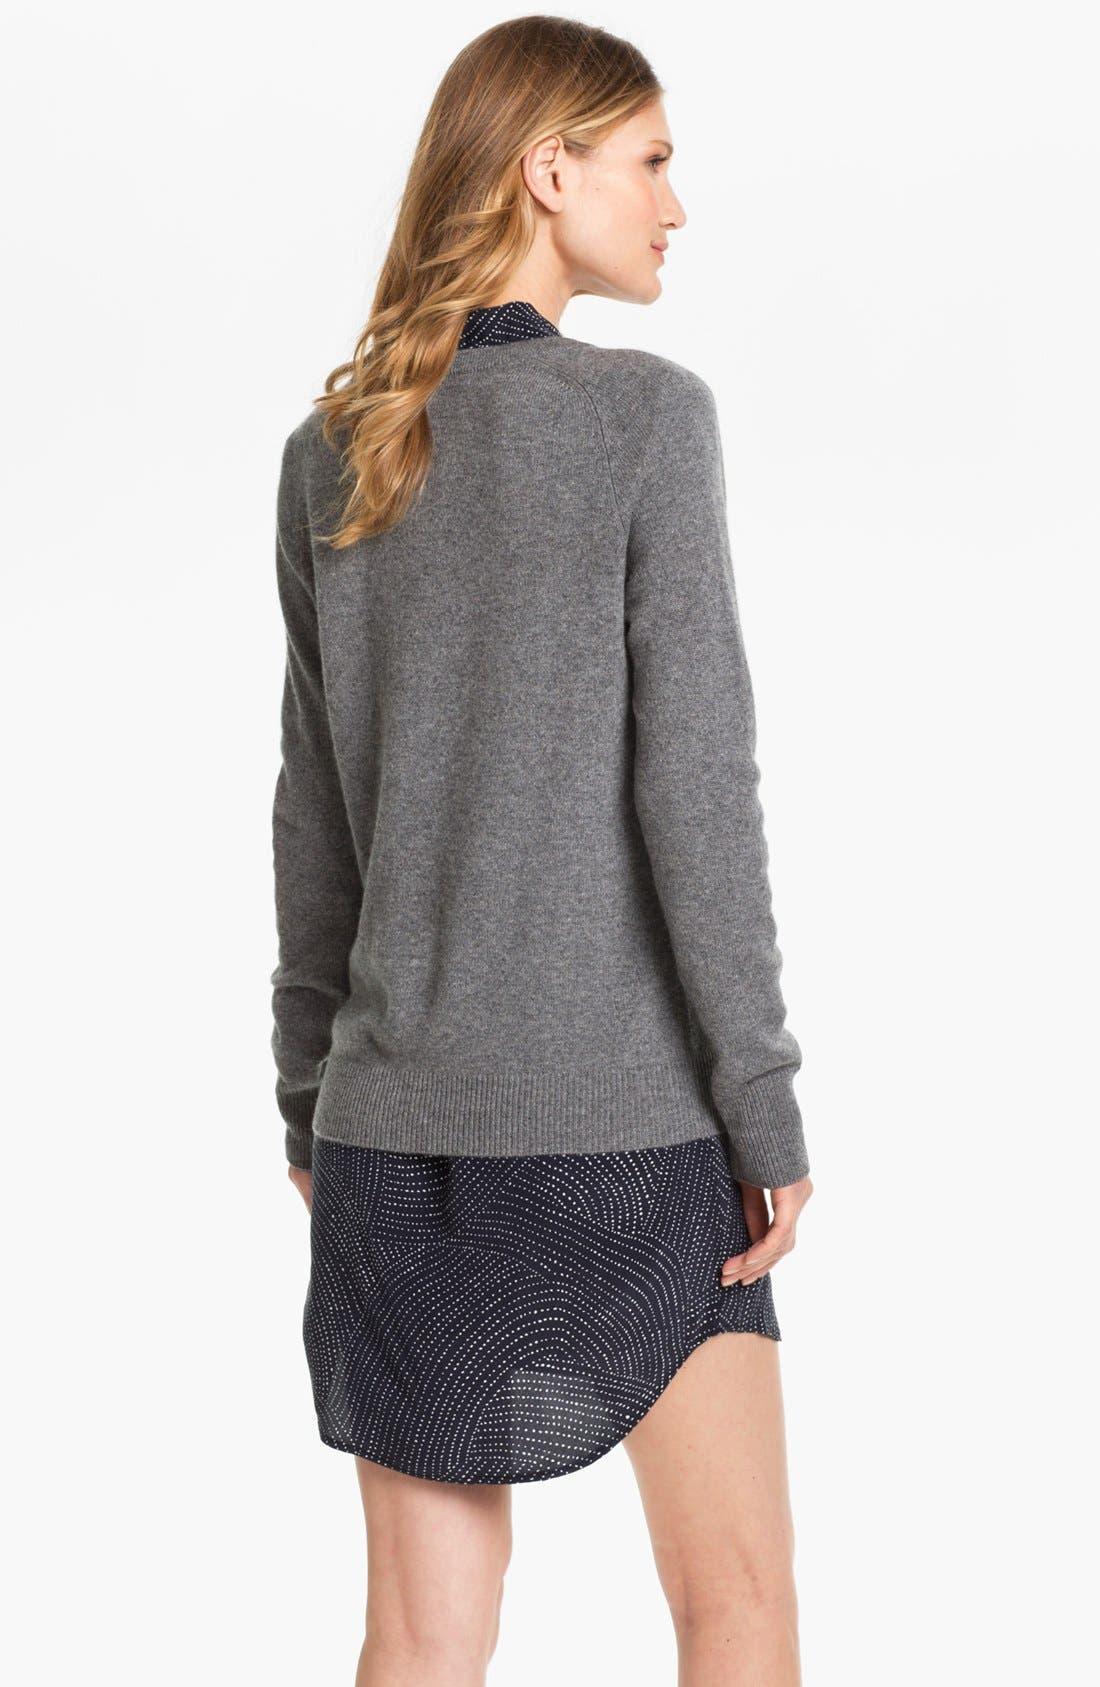 EQUIPMENT, 'Sloane' Crewneck Cashmere Sweater, Alternate thumbnail 8, color, 021